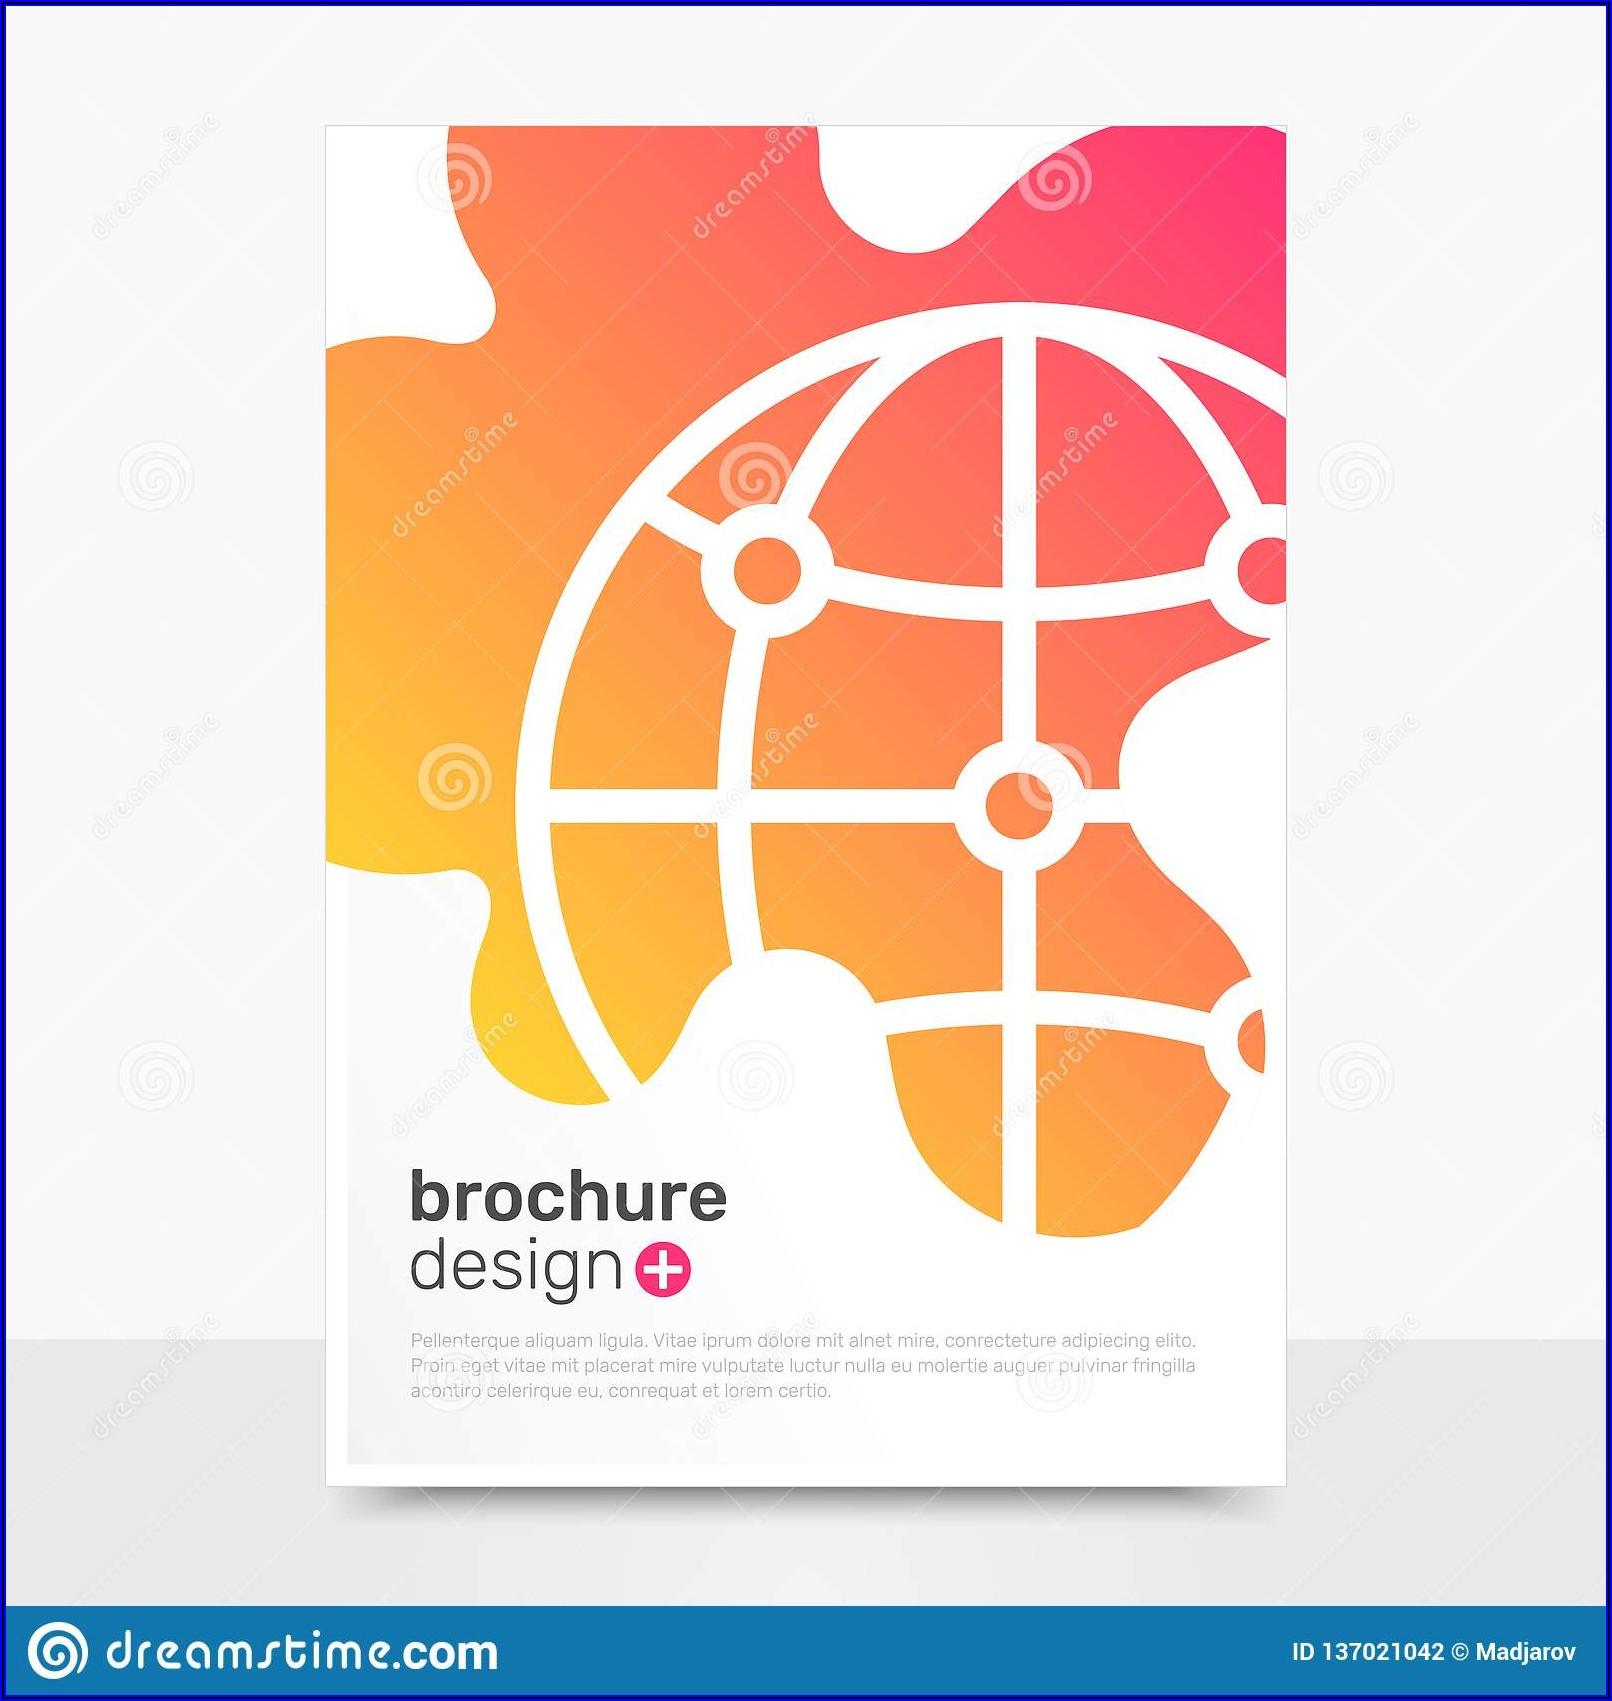 Company Brochure Design Templates